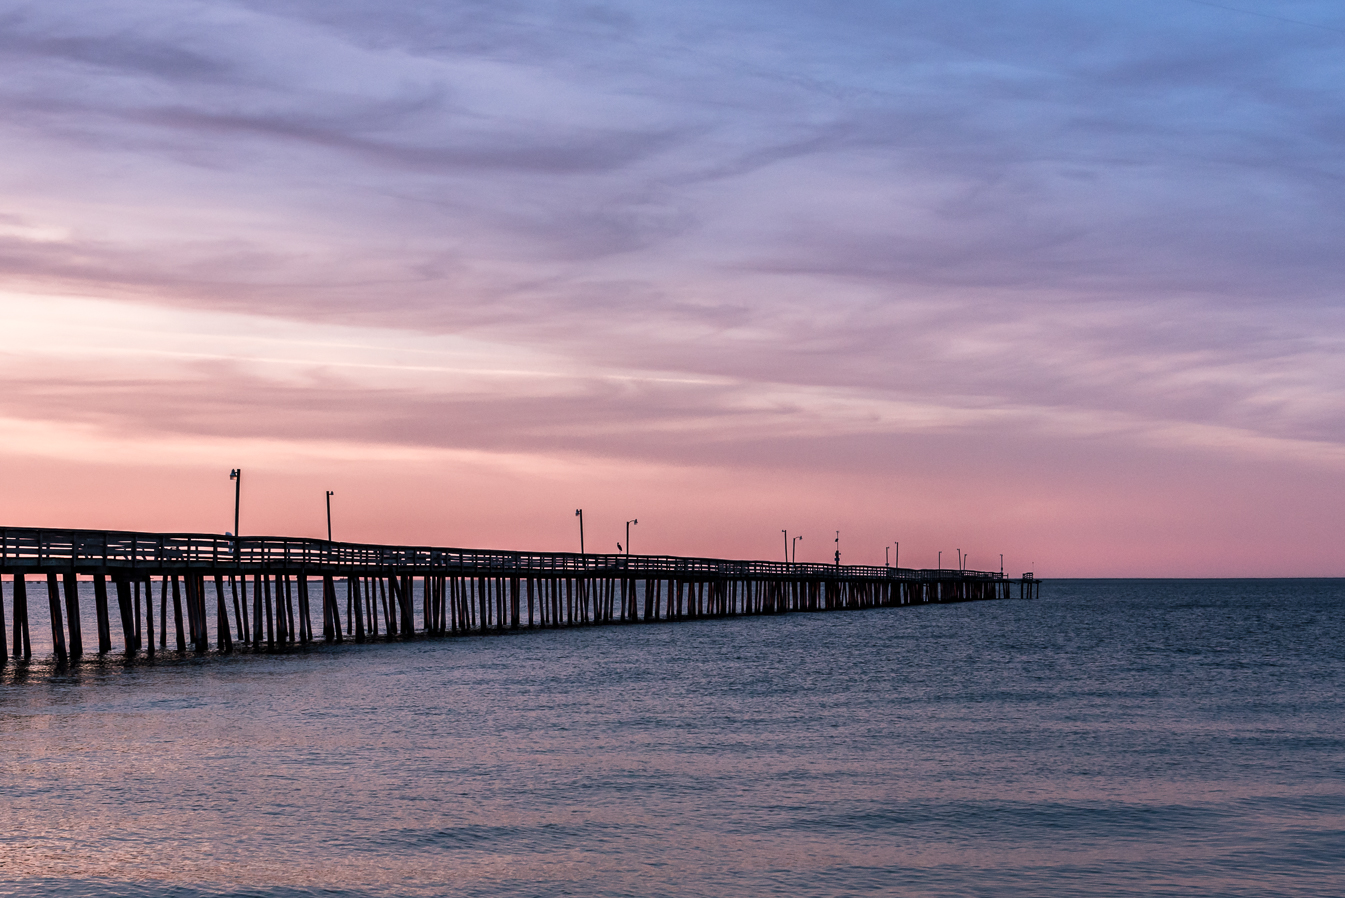 sunset at chics beach, virginia beach photography locations, virginia beach landscape photographer